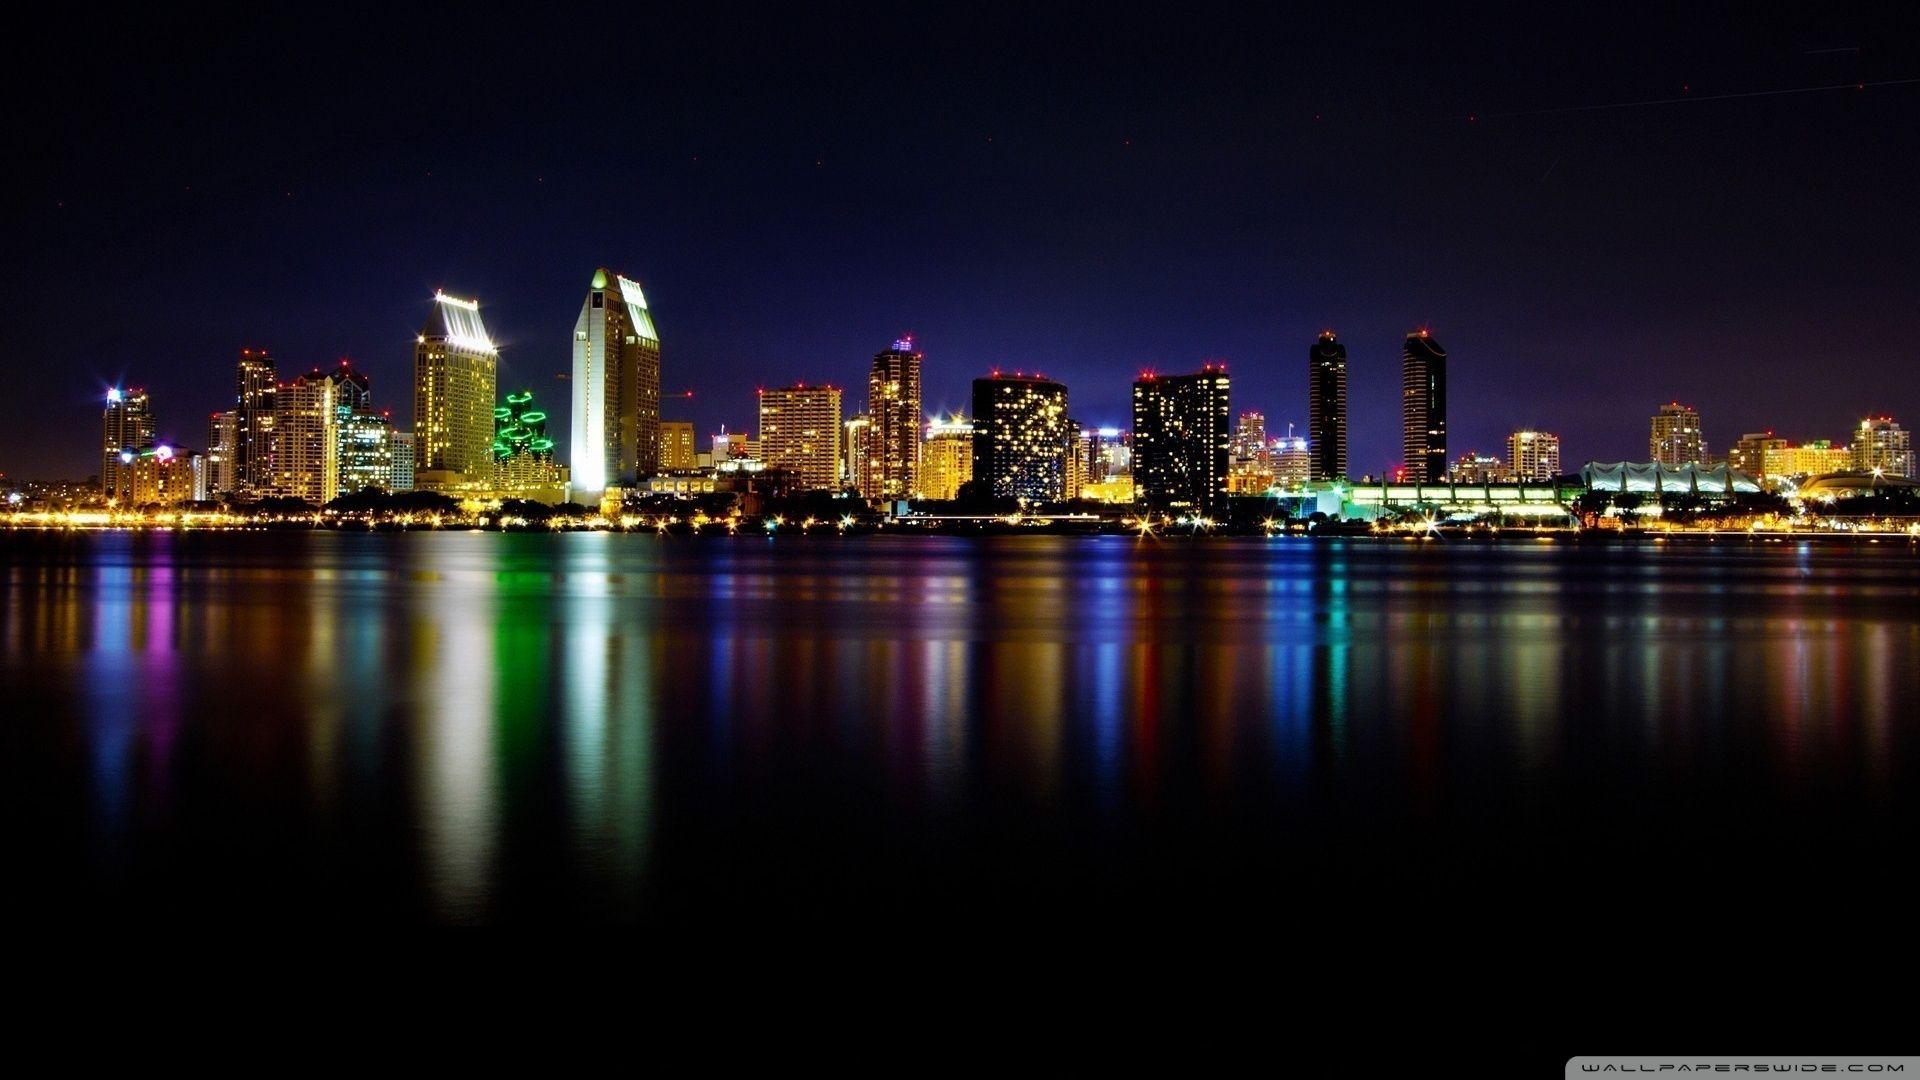 San Diego Skyline Wallpaper Google Search City Wallpaper San Diego Skyline Skyline